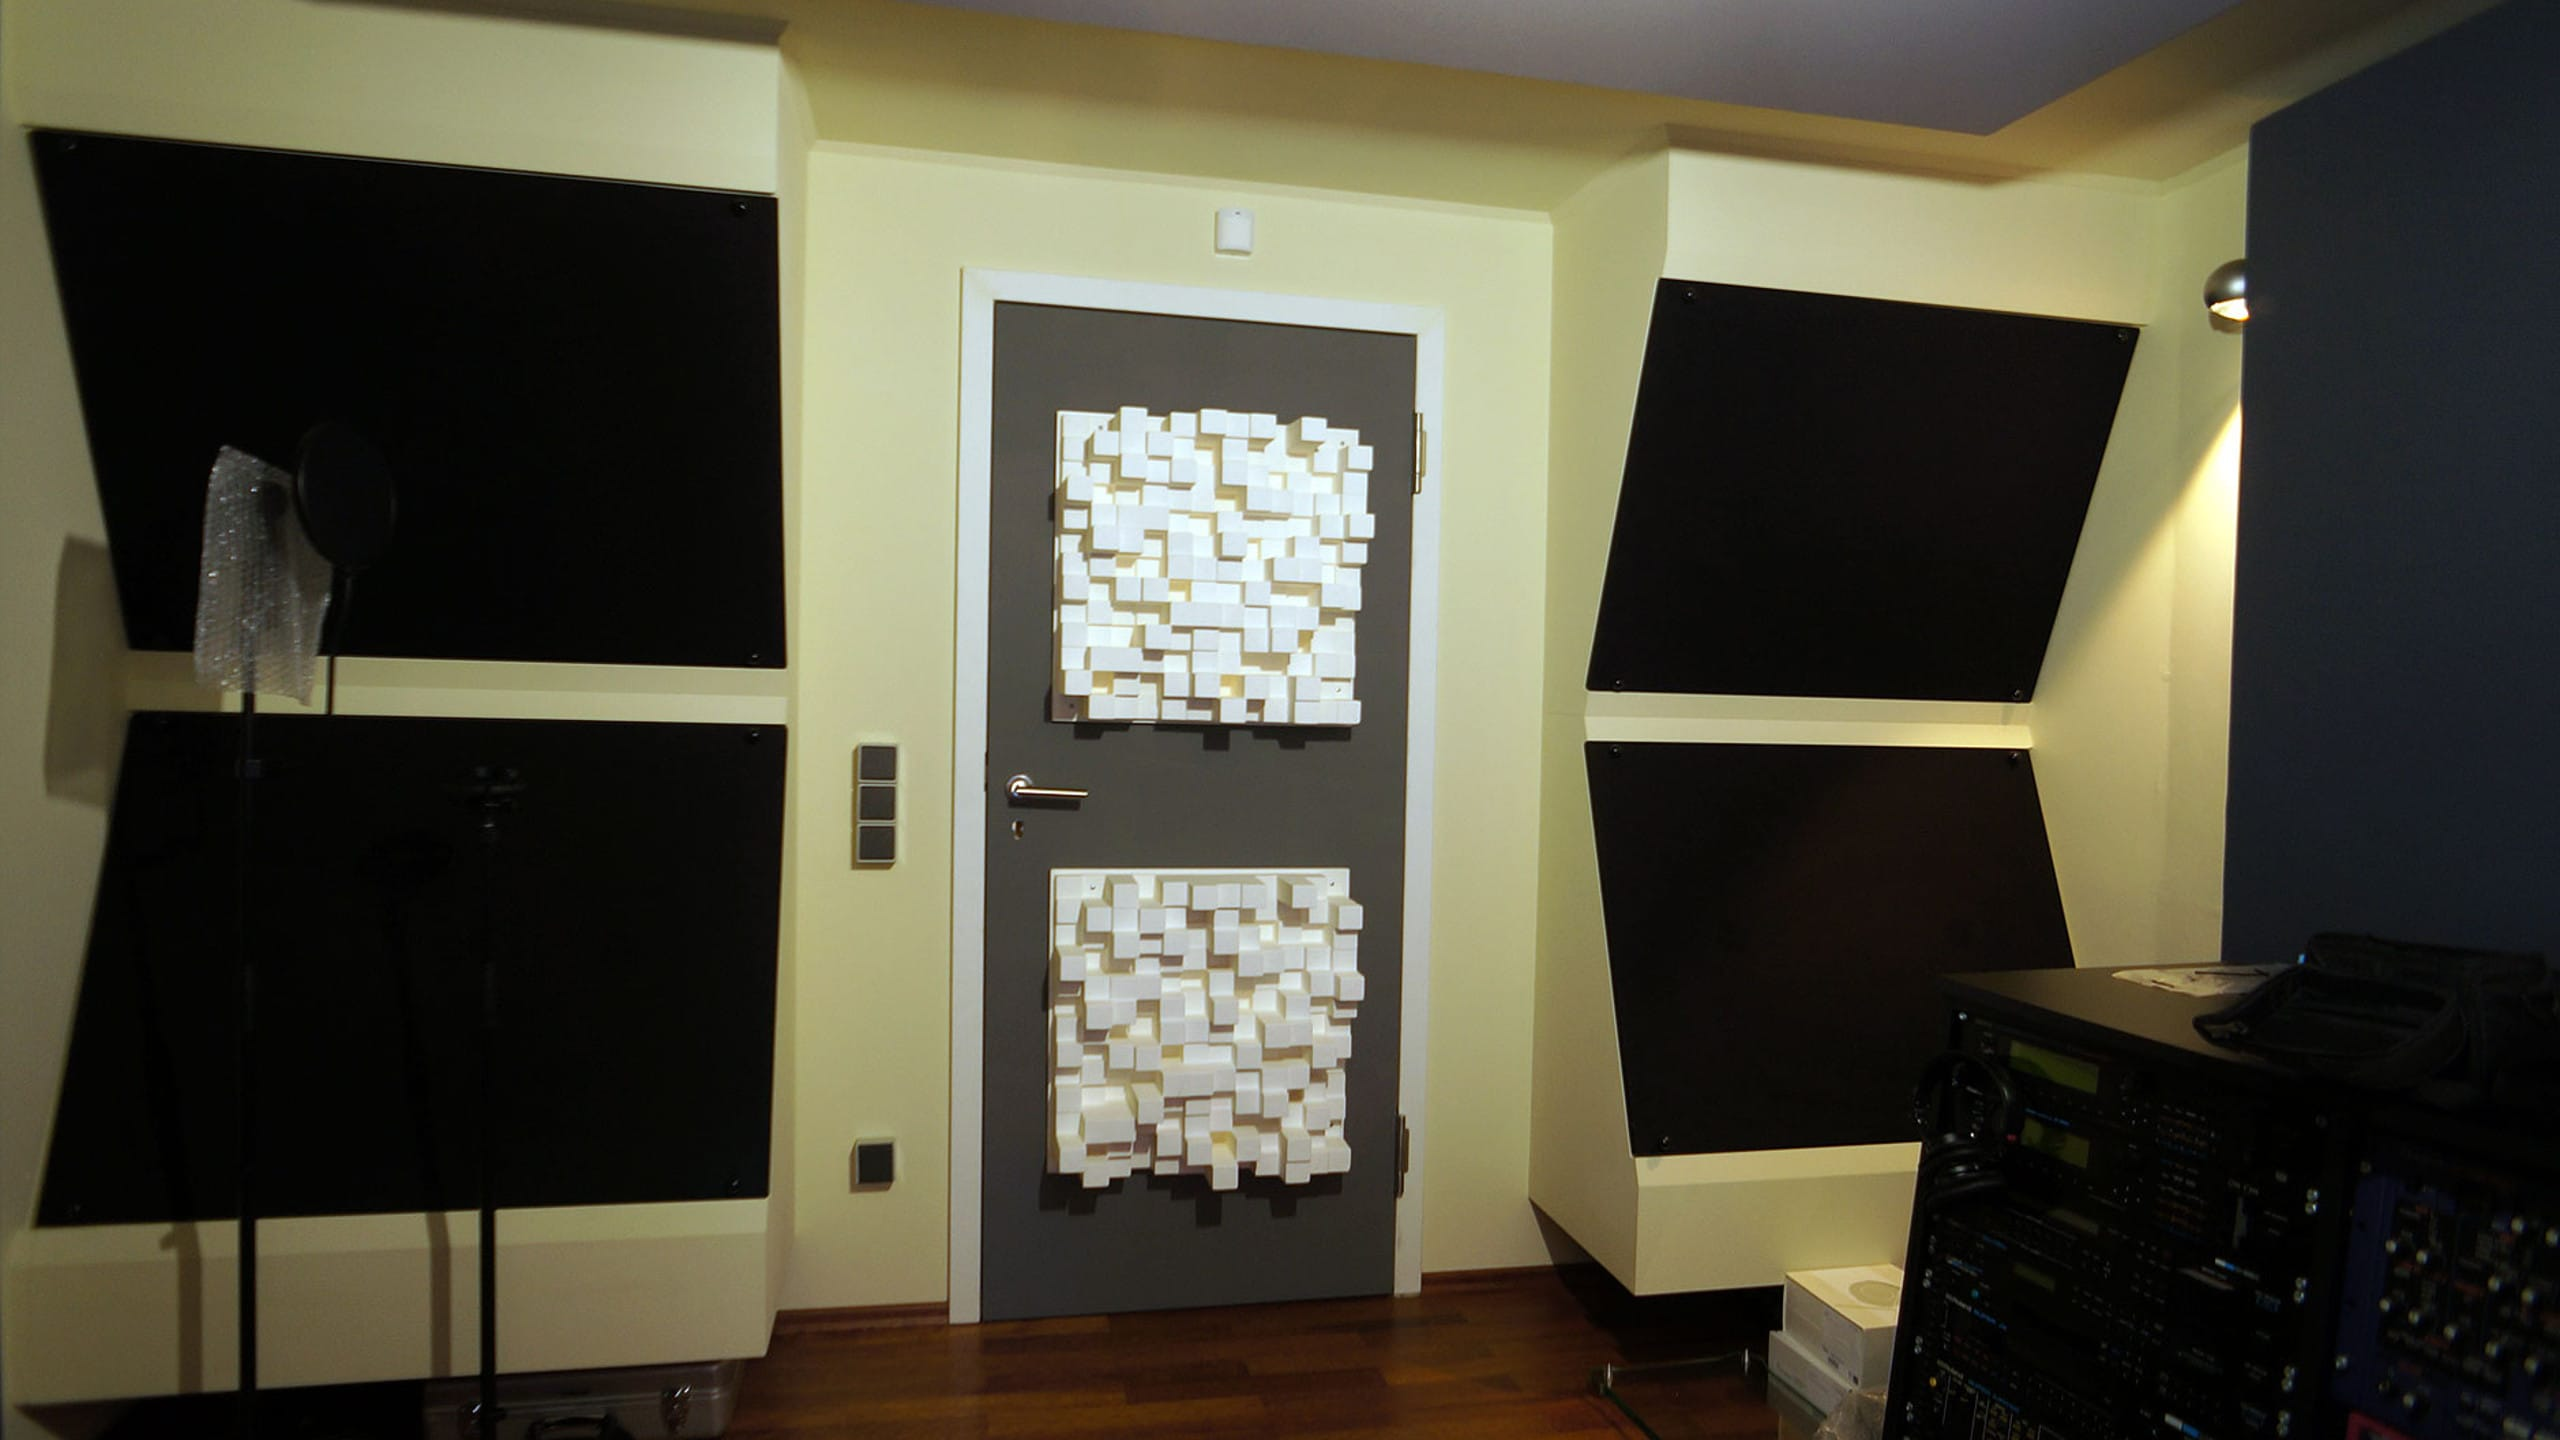 Control room - Back wall